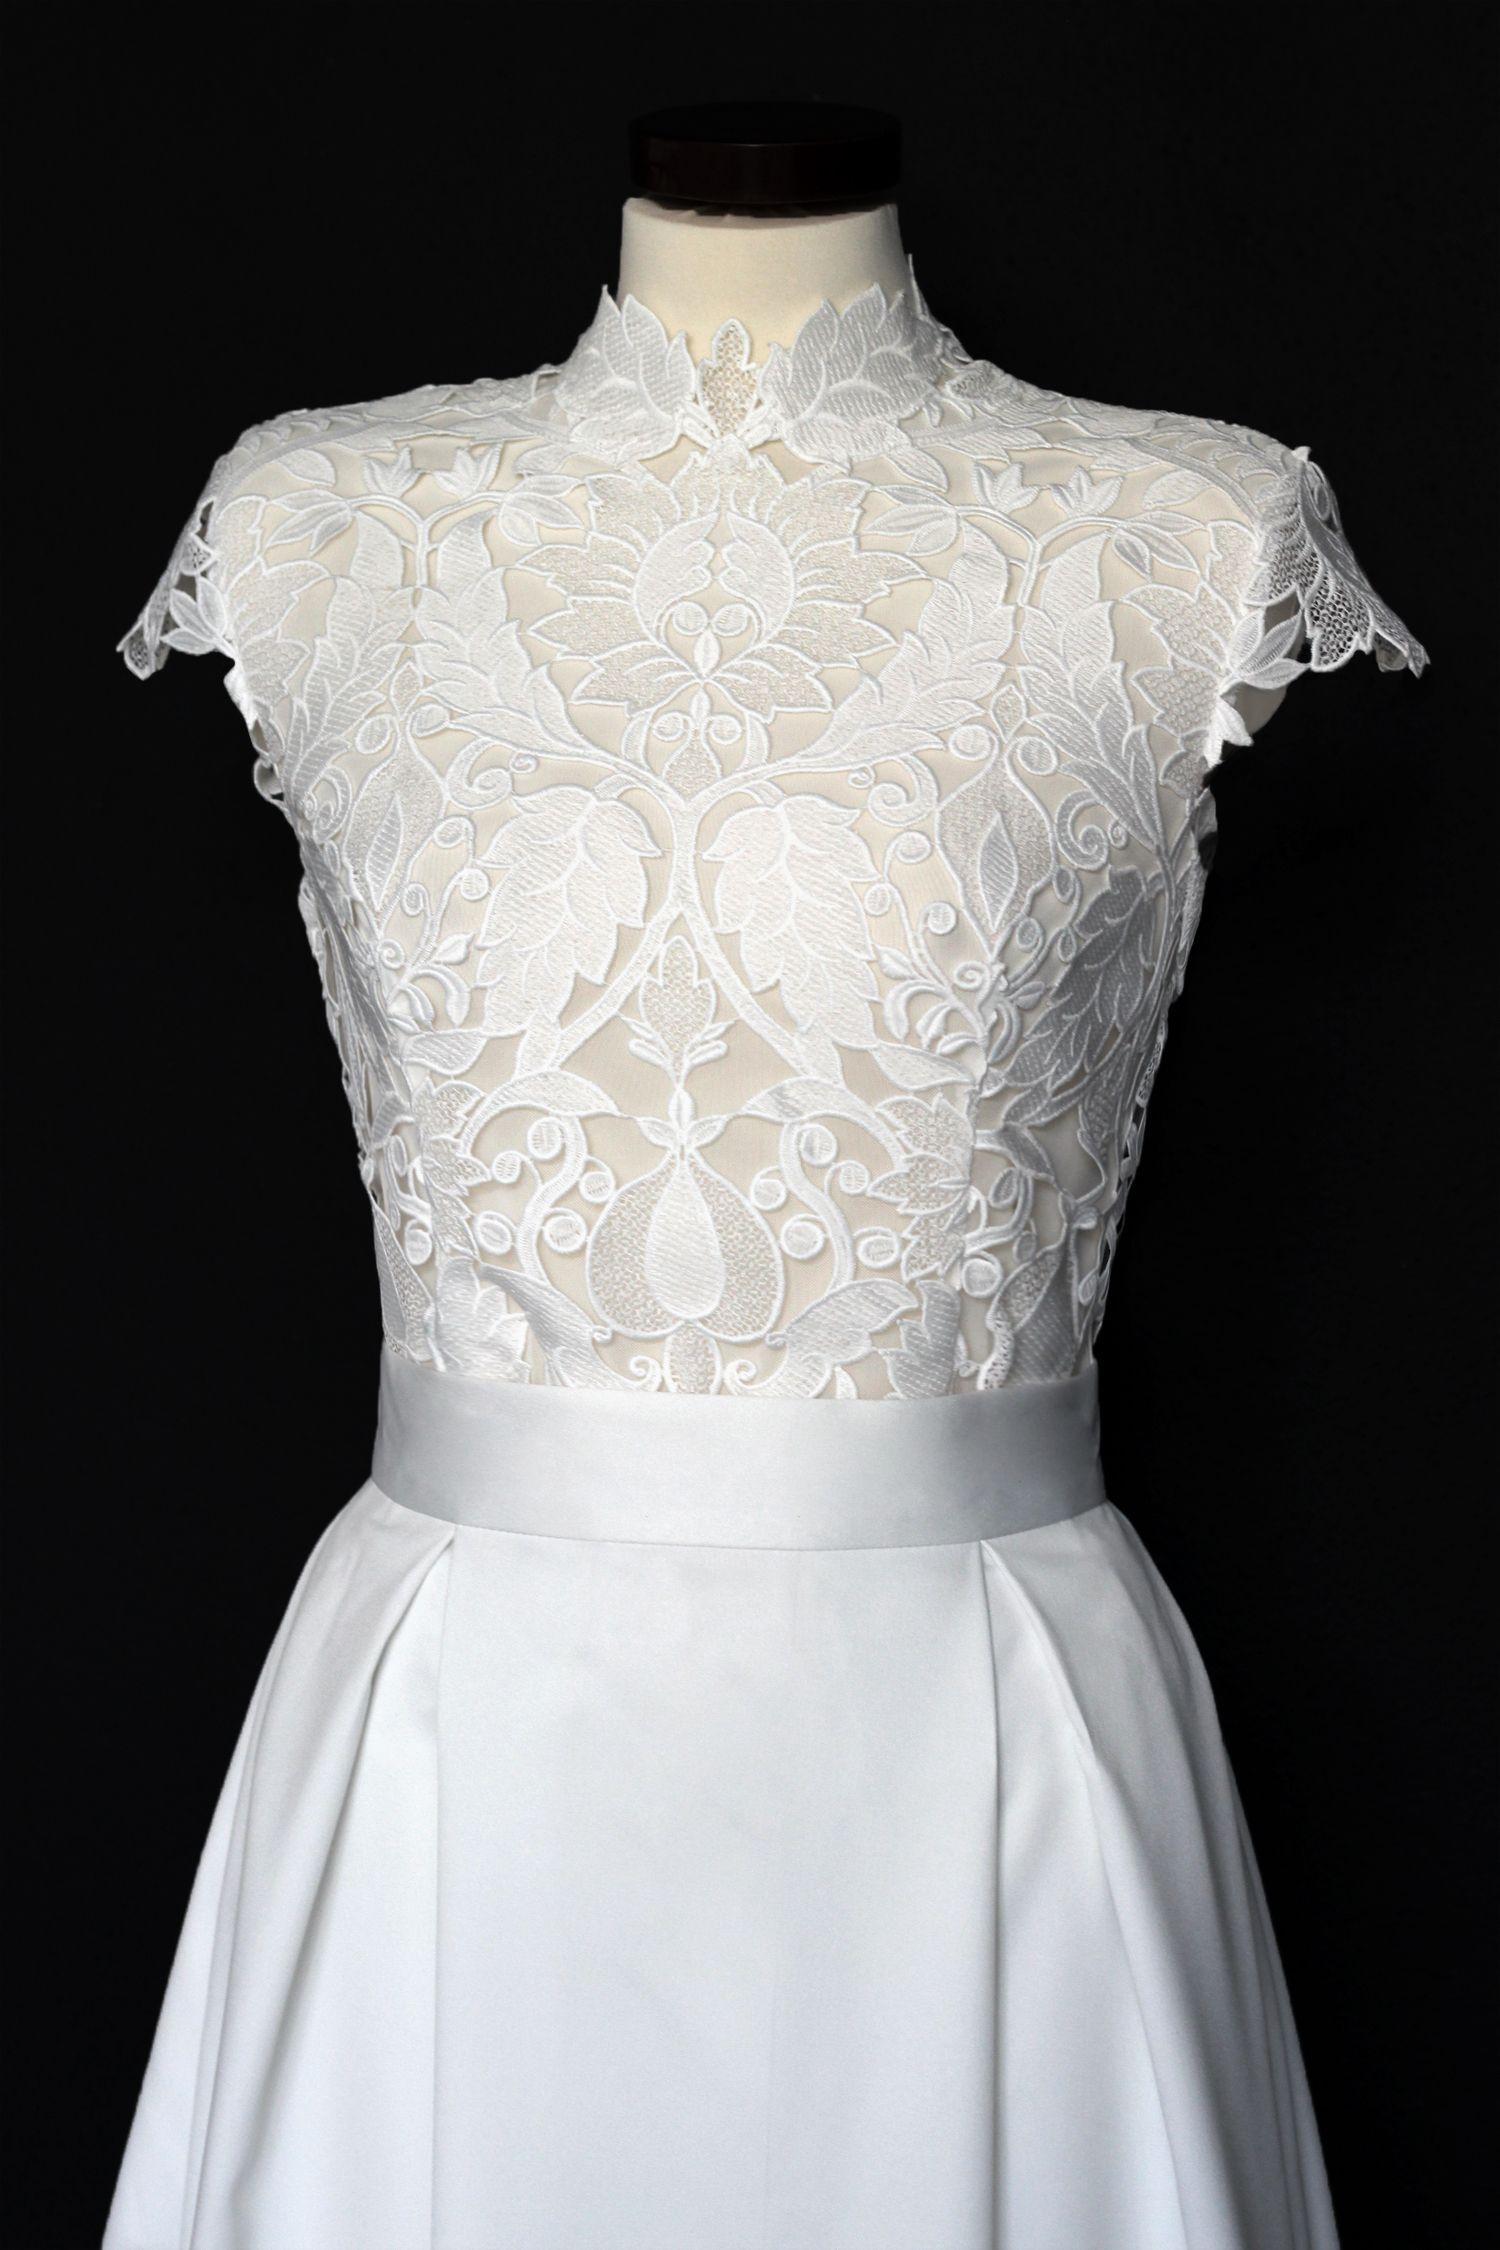 eb4ada30d9e0 Svatební+šaty+z+tlustší+krajky+so+skládaná+sukně+Svadobné+šaty+sú+z+ ...